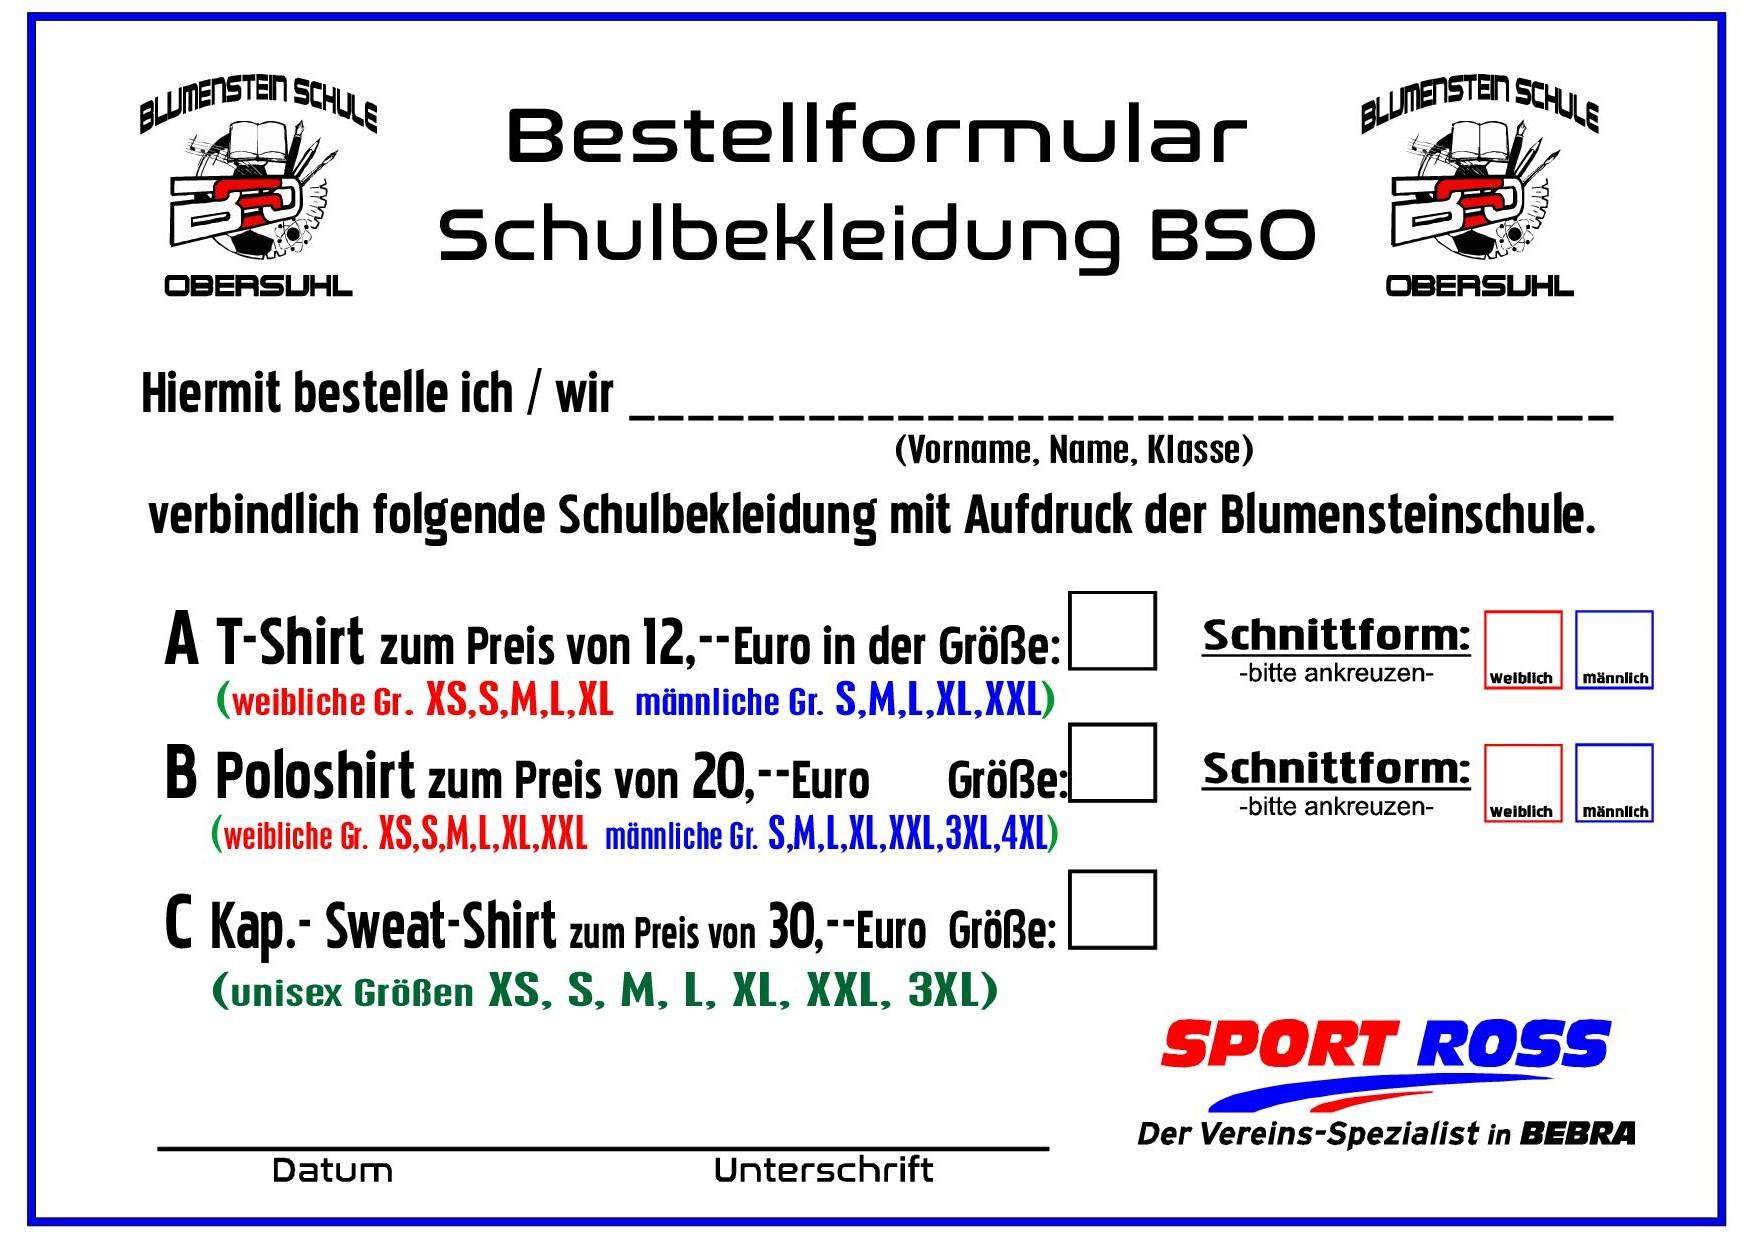 Charmant Blank Buchhaltung Arbeitsblatt Bilder - Mathe Arbeitsblatt ...